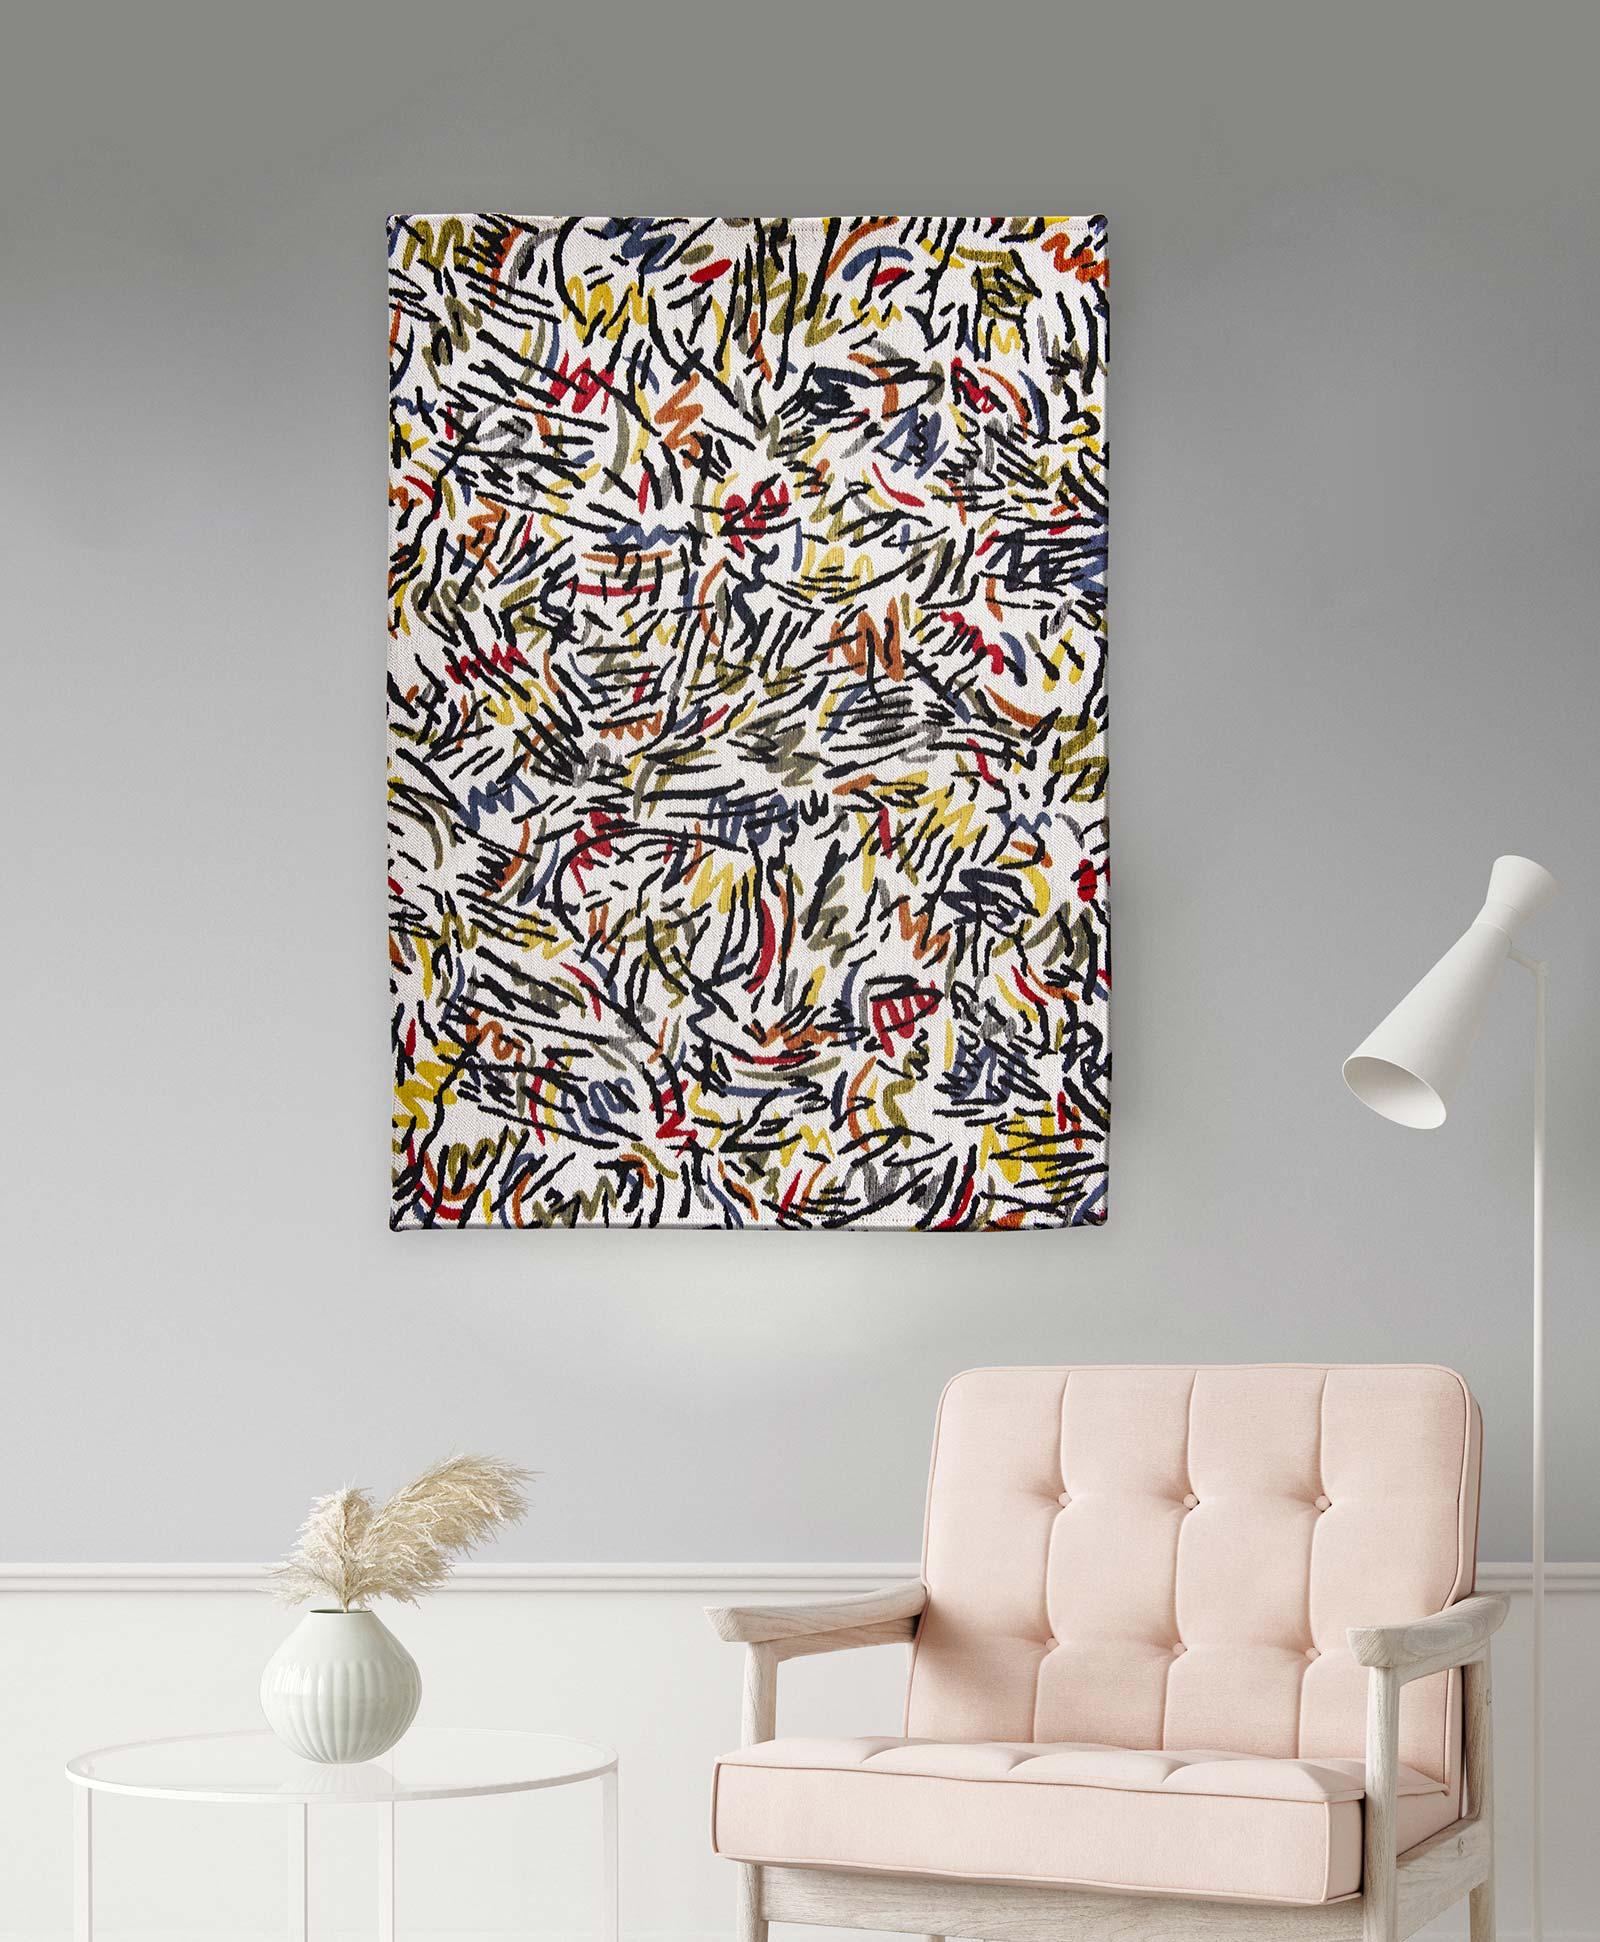 Louis De Poortere rug CS 9144 Gallery Graffito Street Graph interior